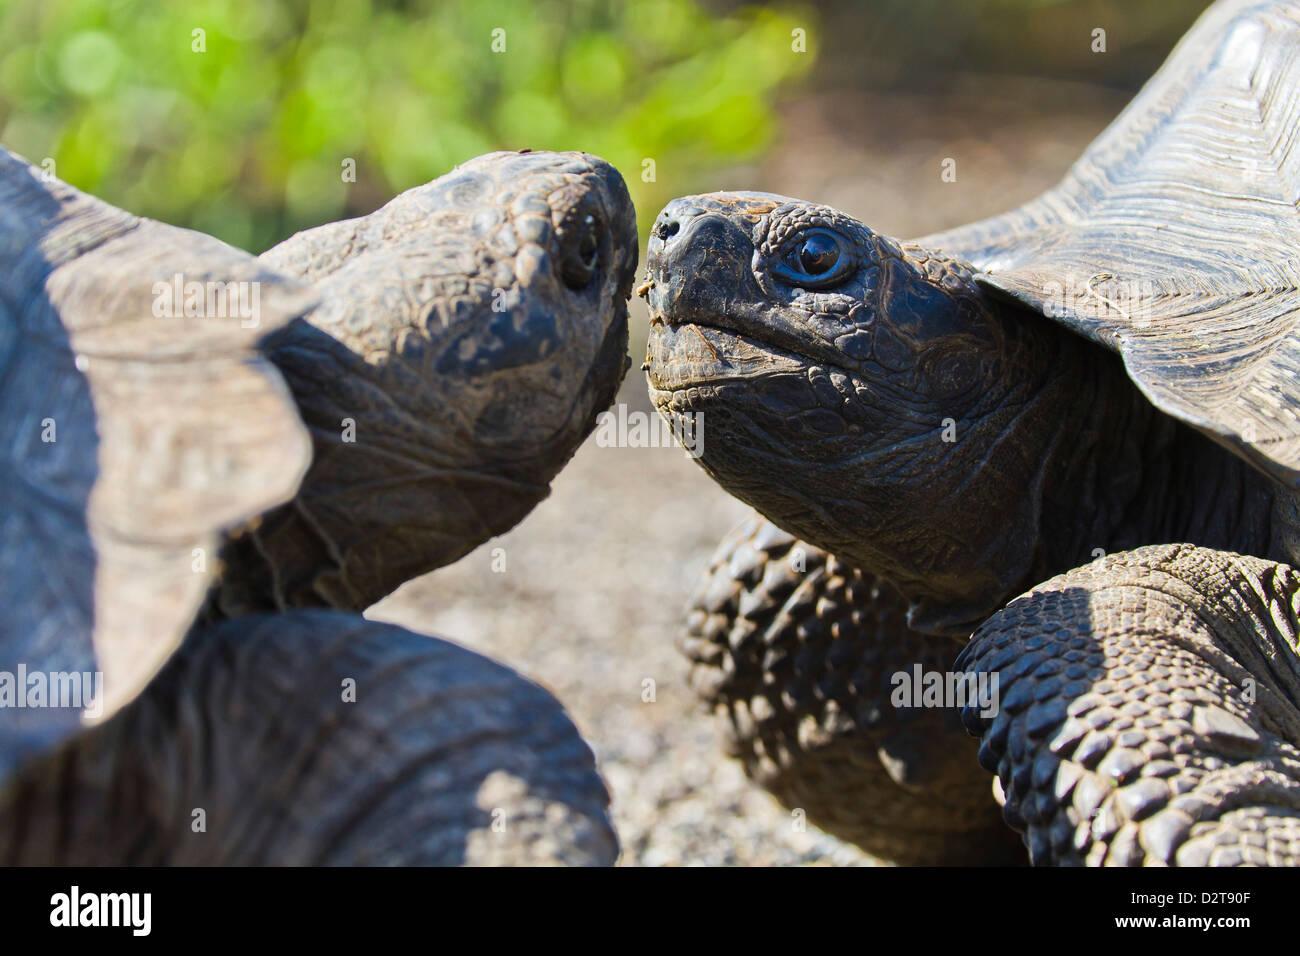 Wild Galapagos tortoise (Geochelone elephantopus), Urbina Bay, Isabela Island, Galapagos Islands, Ecuador - Stock Image